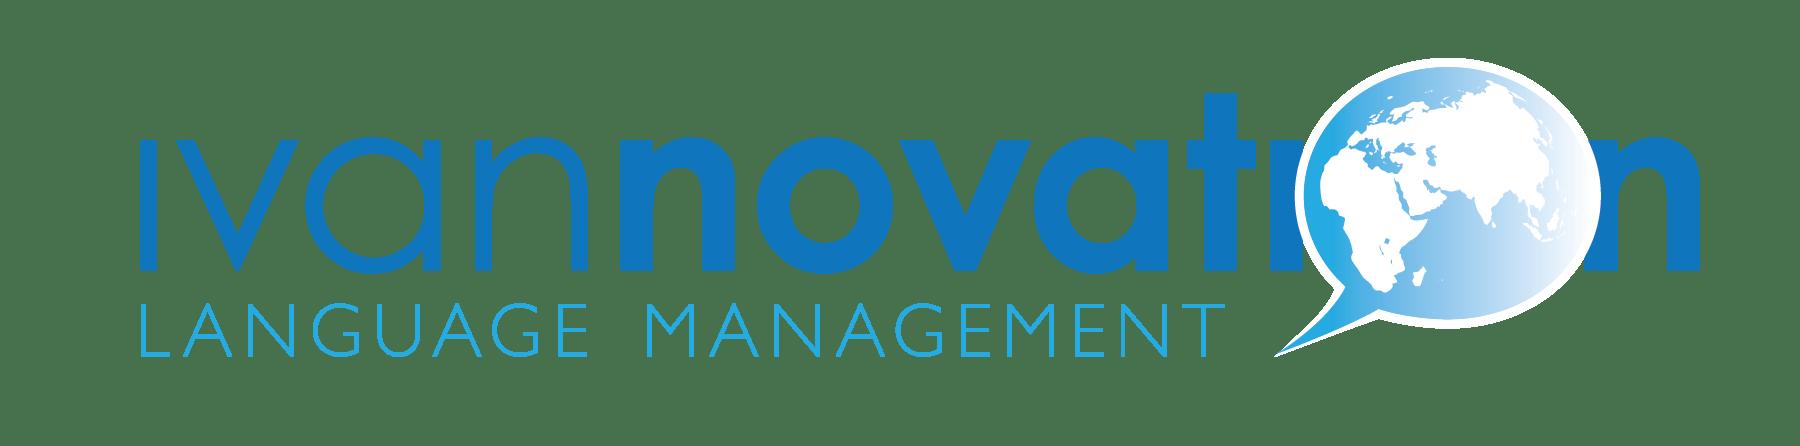 ivannovation-logo